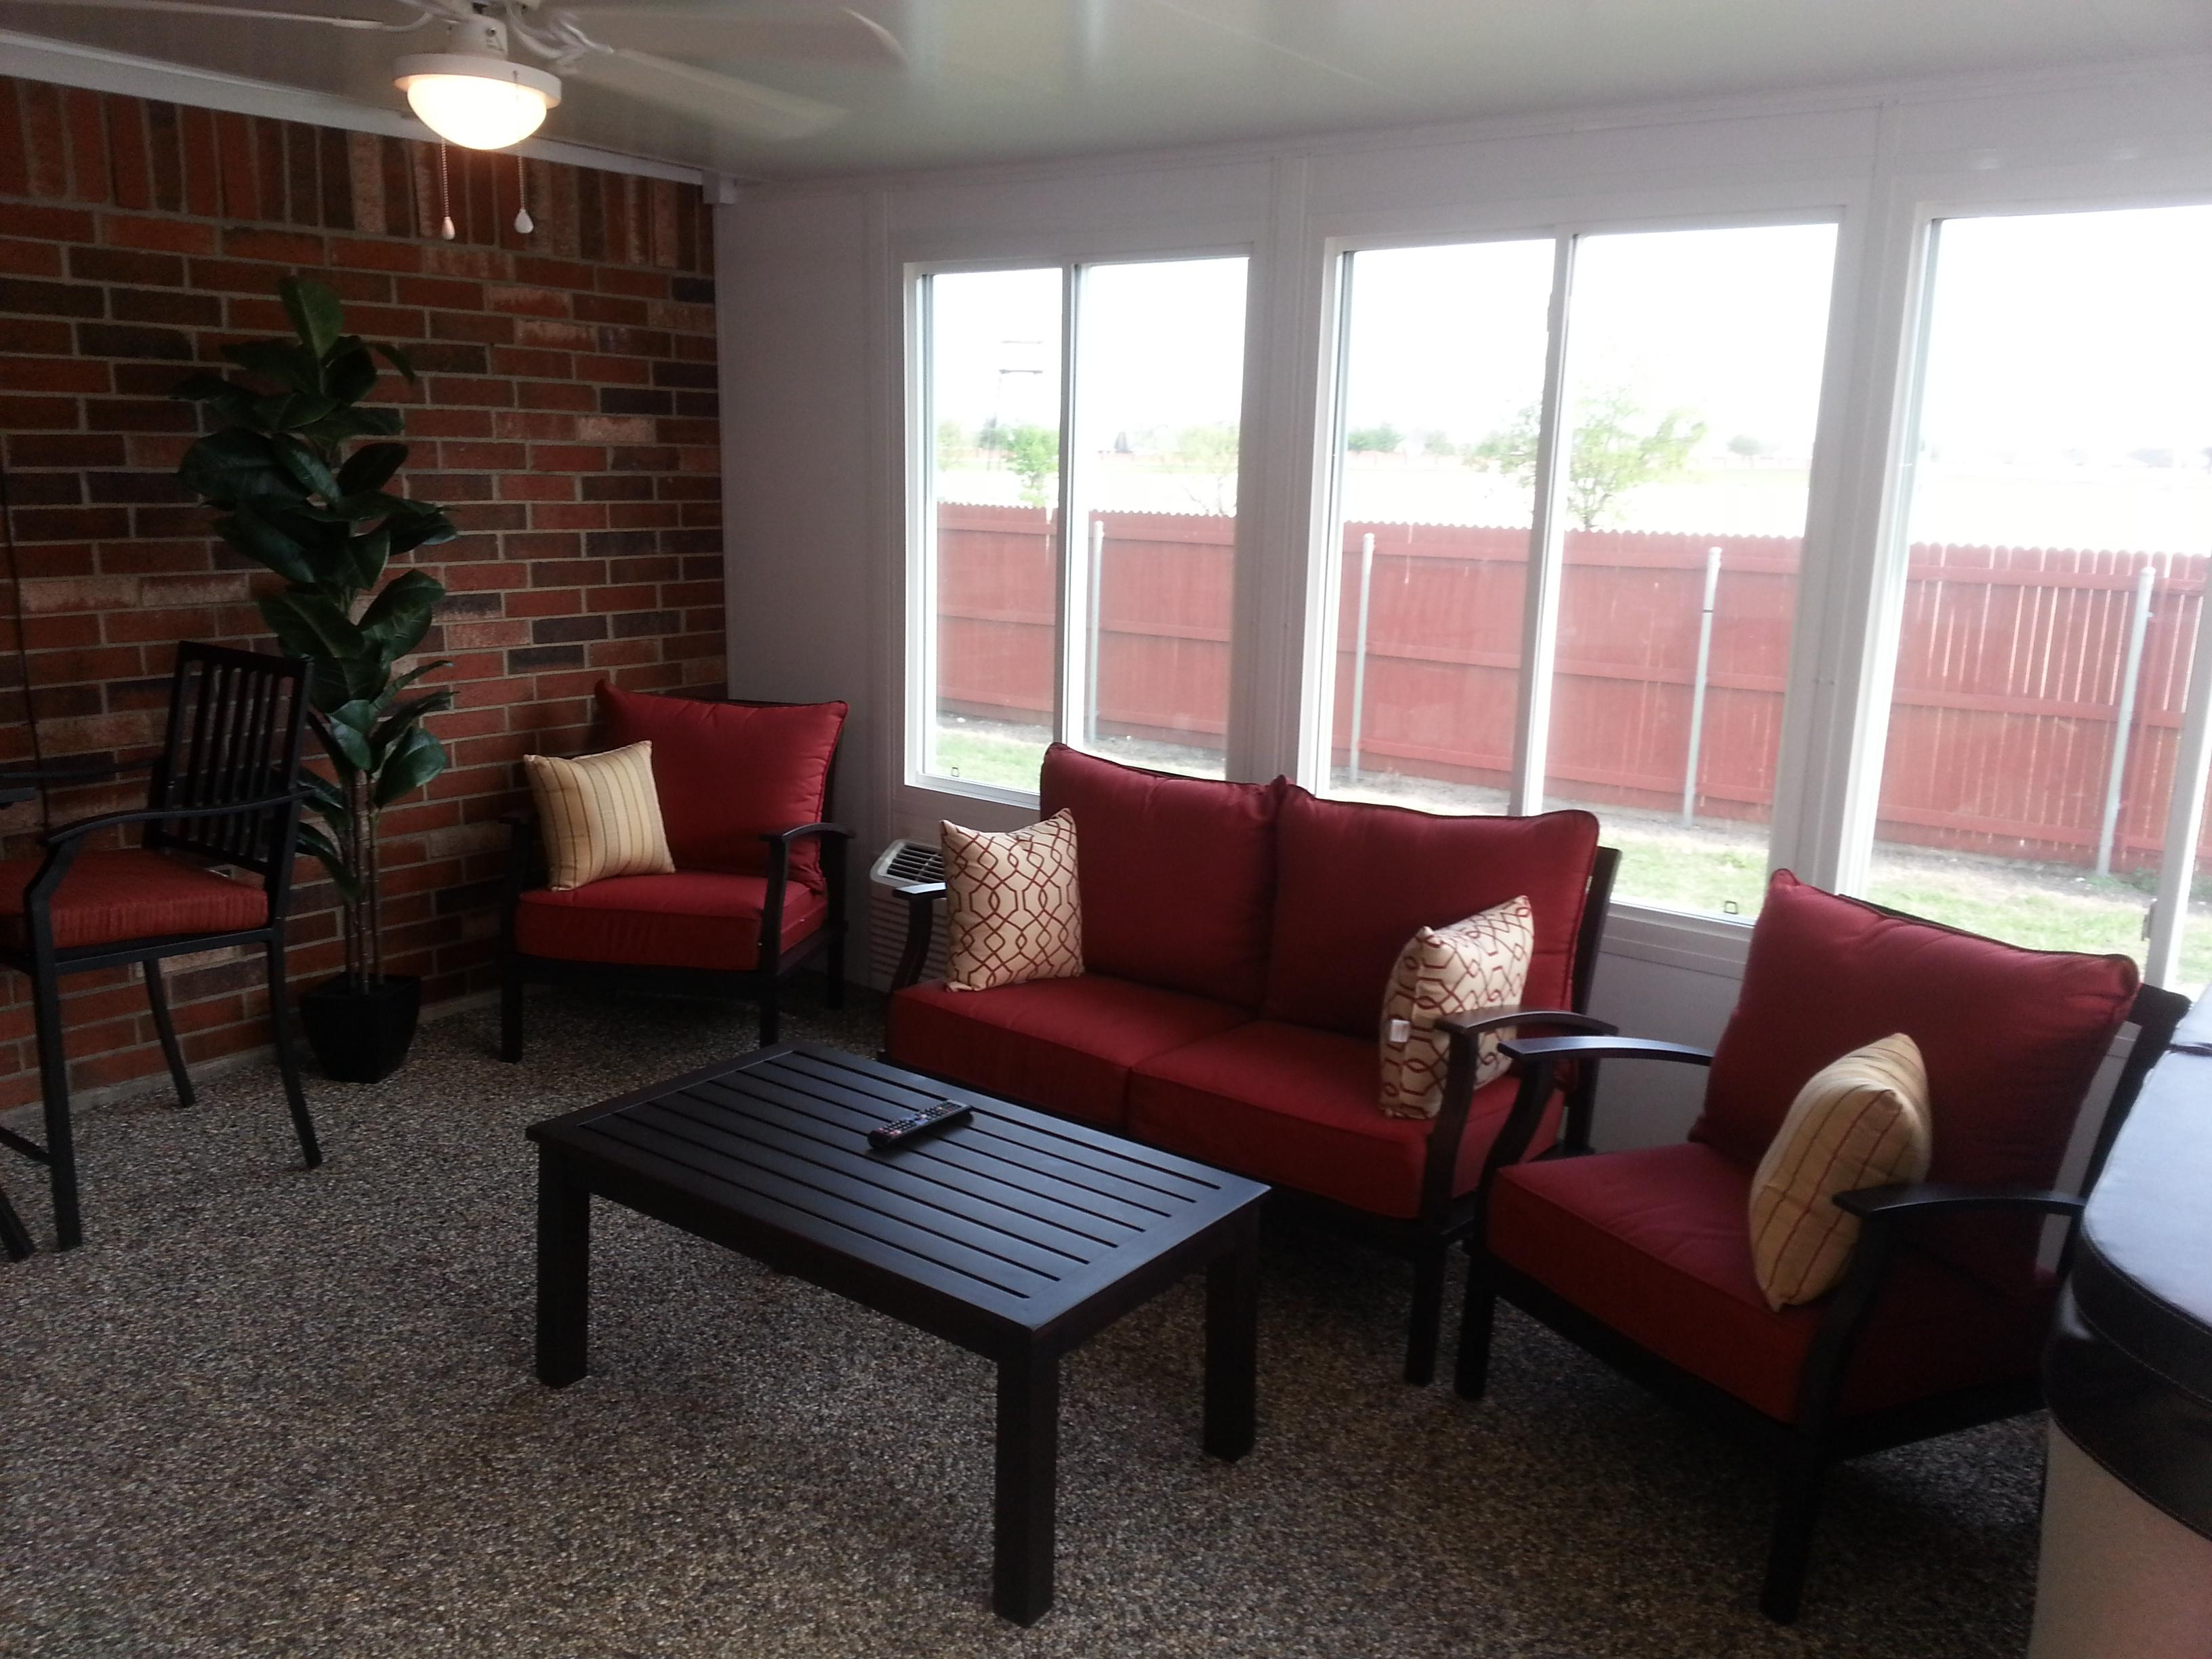 Coleman Bright Ideas For Your Home A Bioguard Platinum Dealer